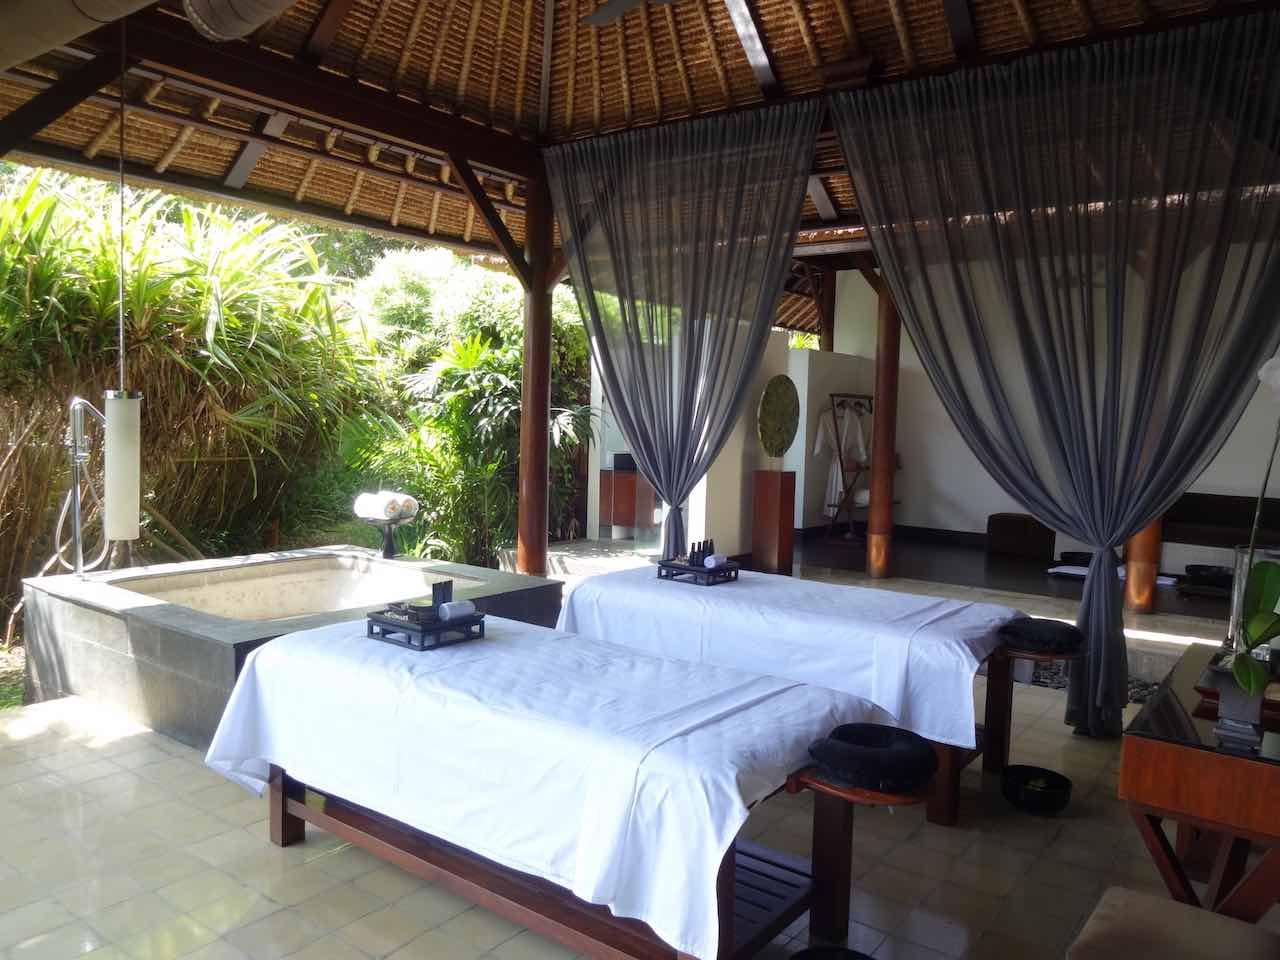 Best 5 star hotel villa ubud alila bali luxury bucket list for Best luxury hotels in ubud bali